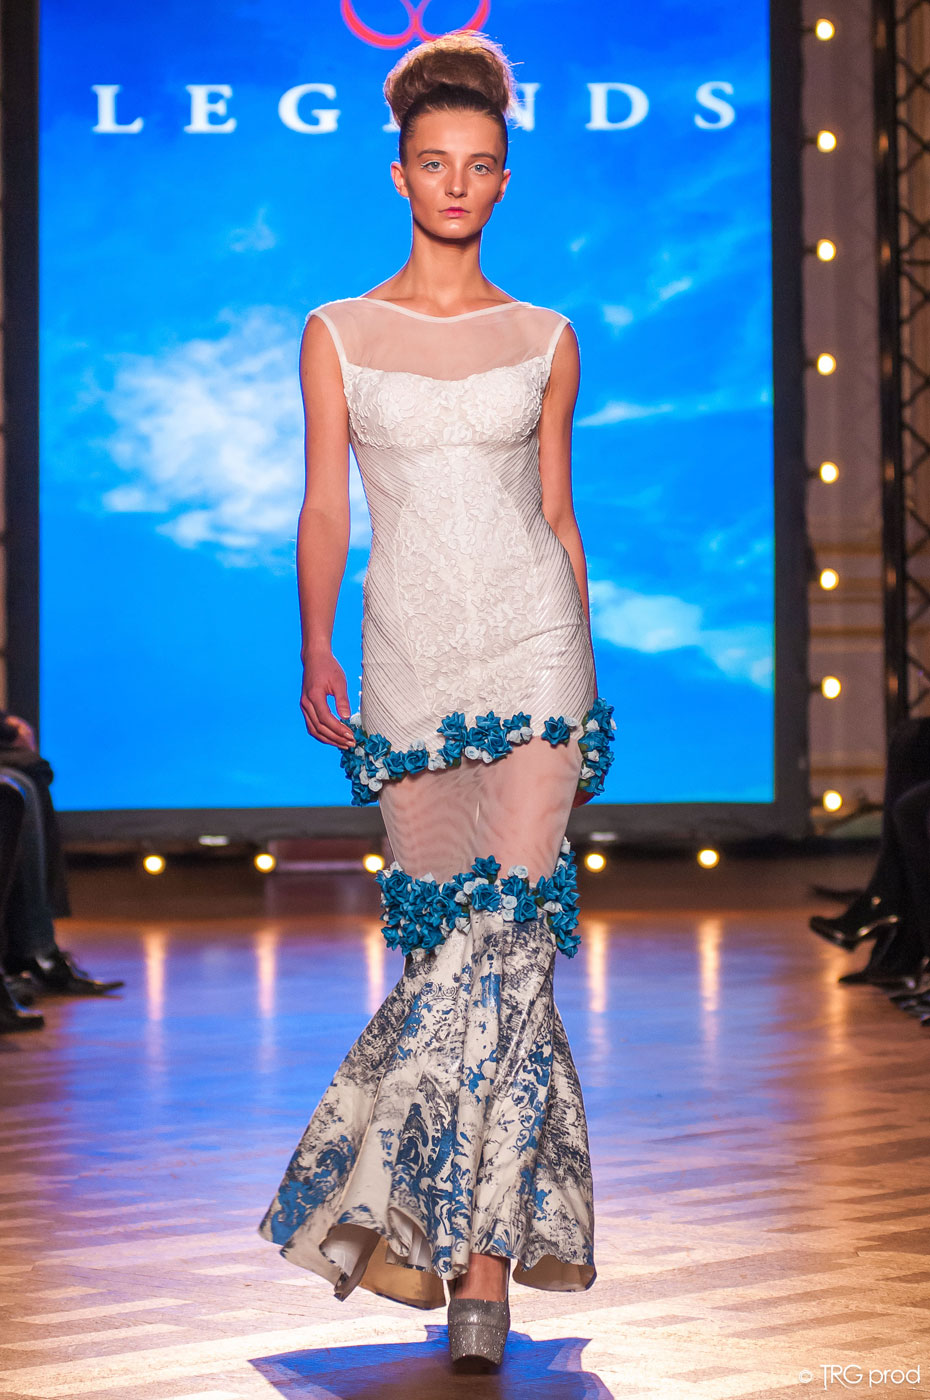 Legends-fashion-runway-show-haute-couture-paris-spring-2015-the-impression-06